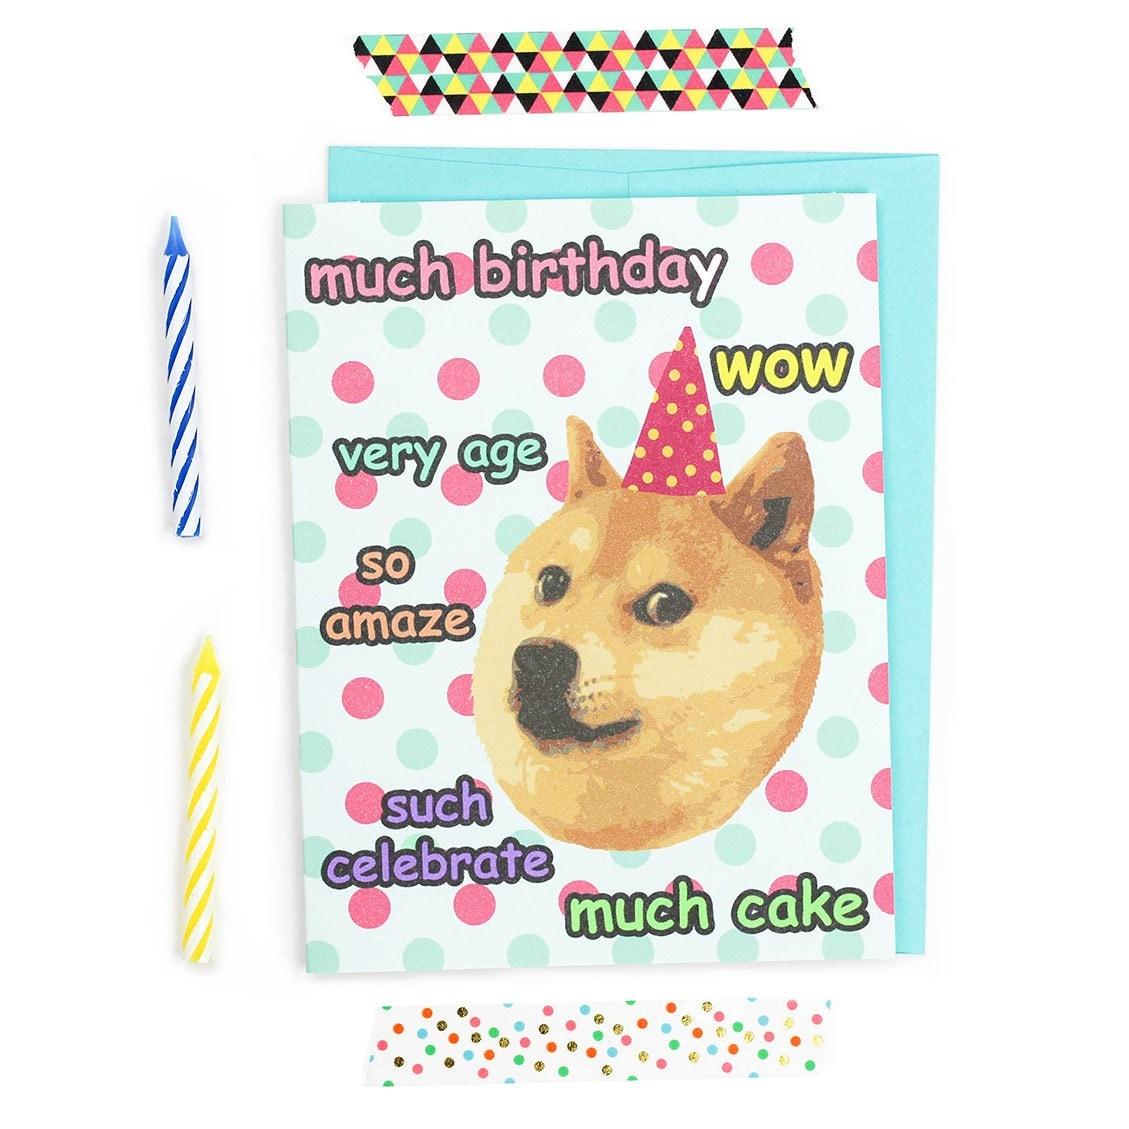 Doge Card Funny Birthday Card Dank Memes Shiba Inu Dog